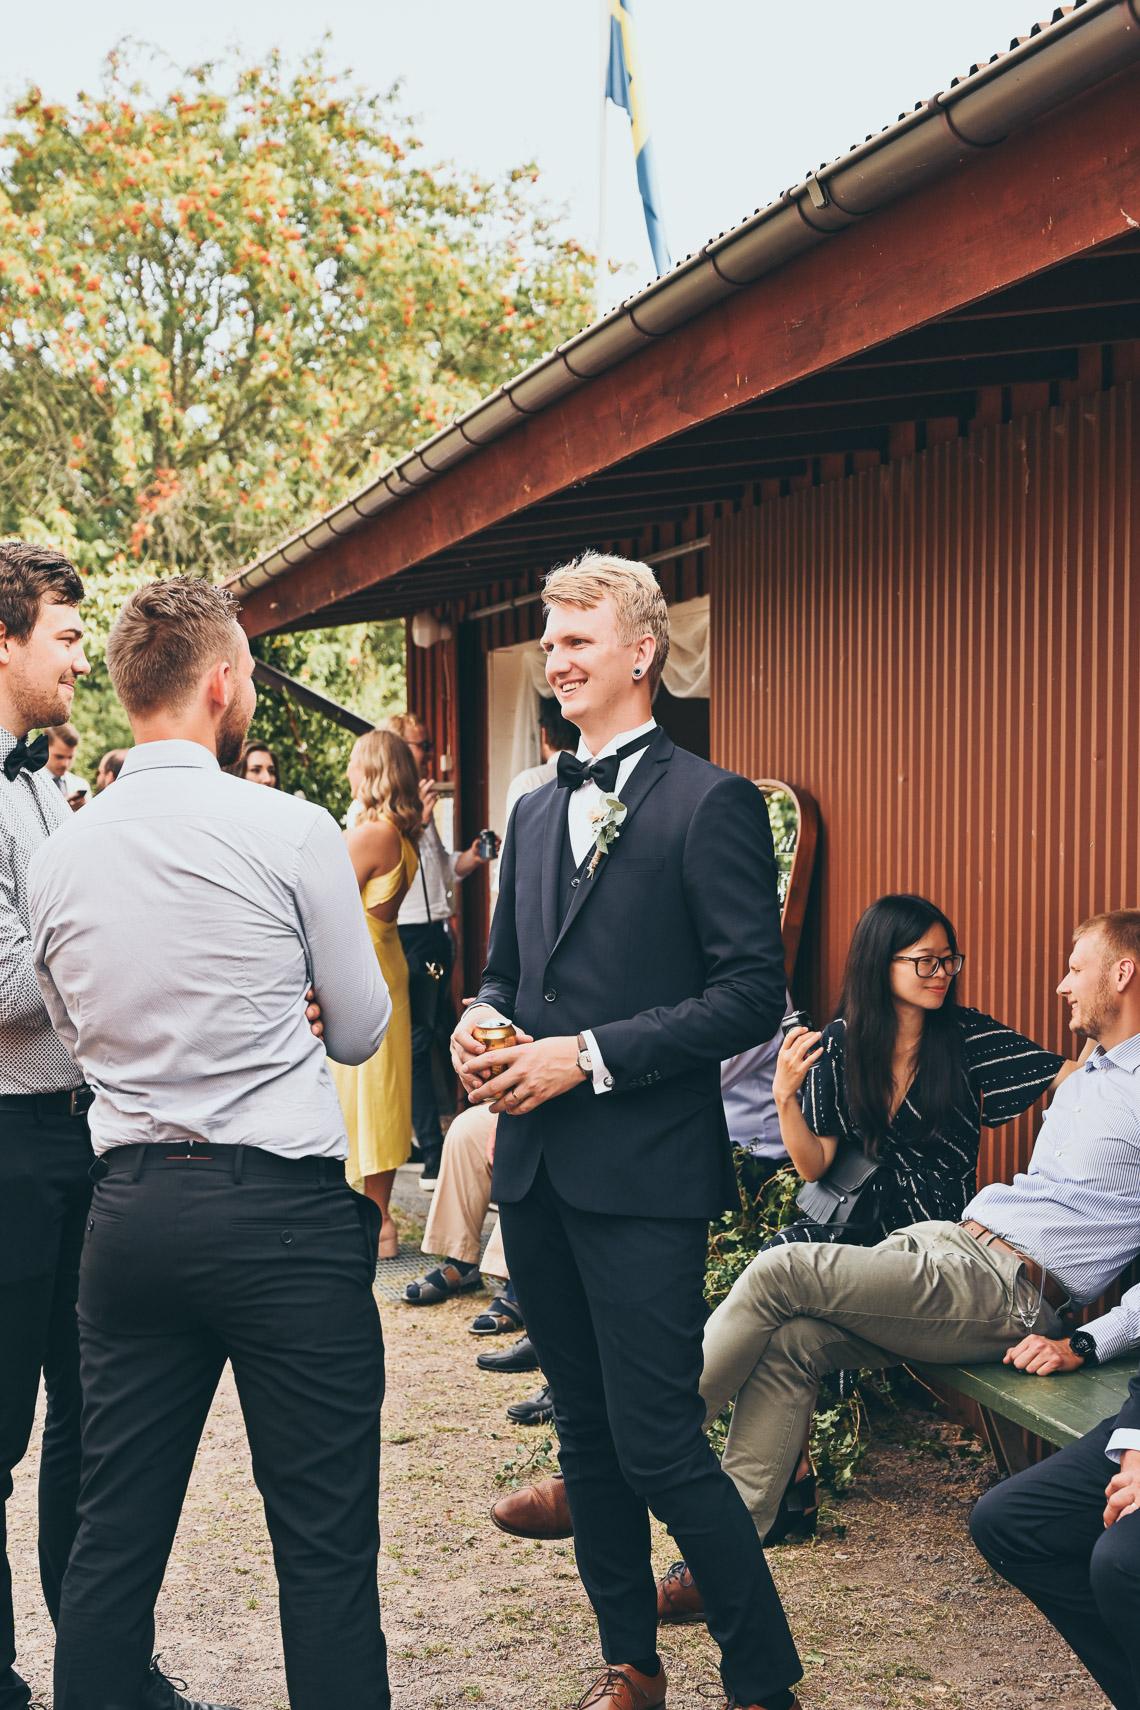 kaffetorpet bröllop Oknö